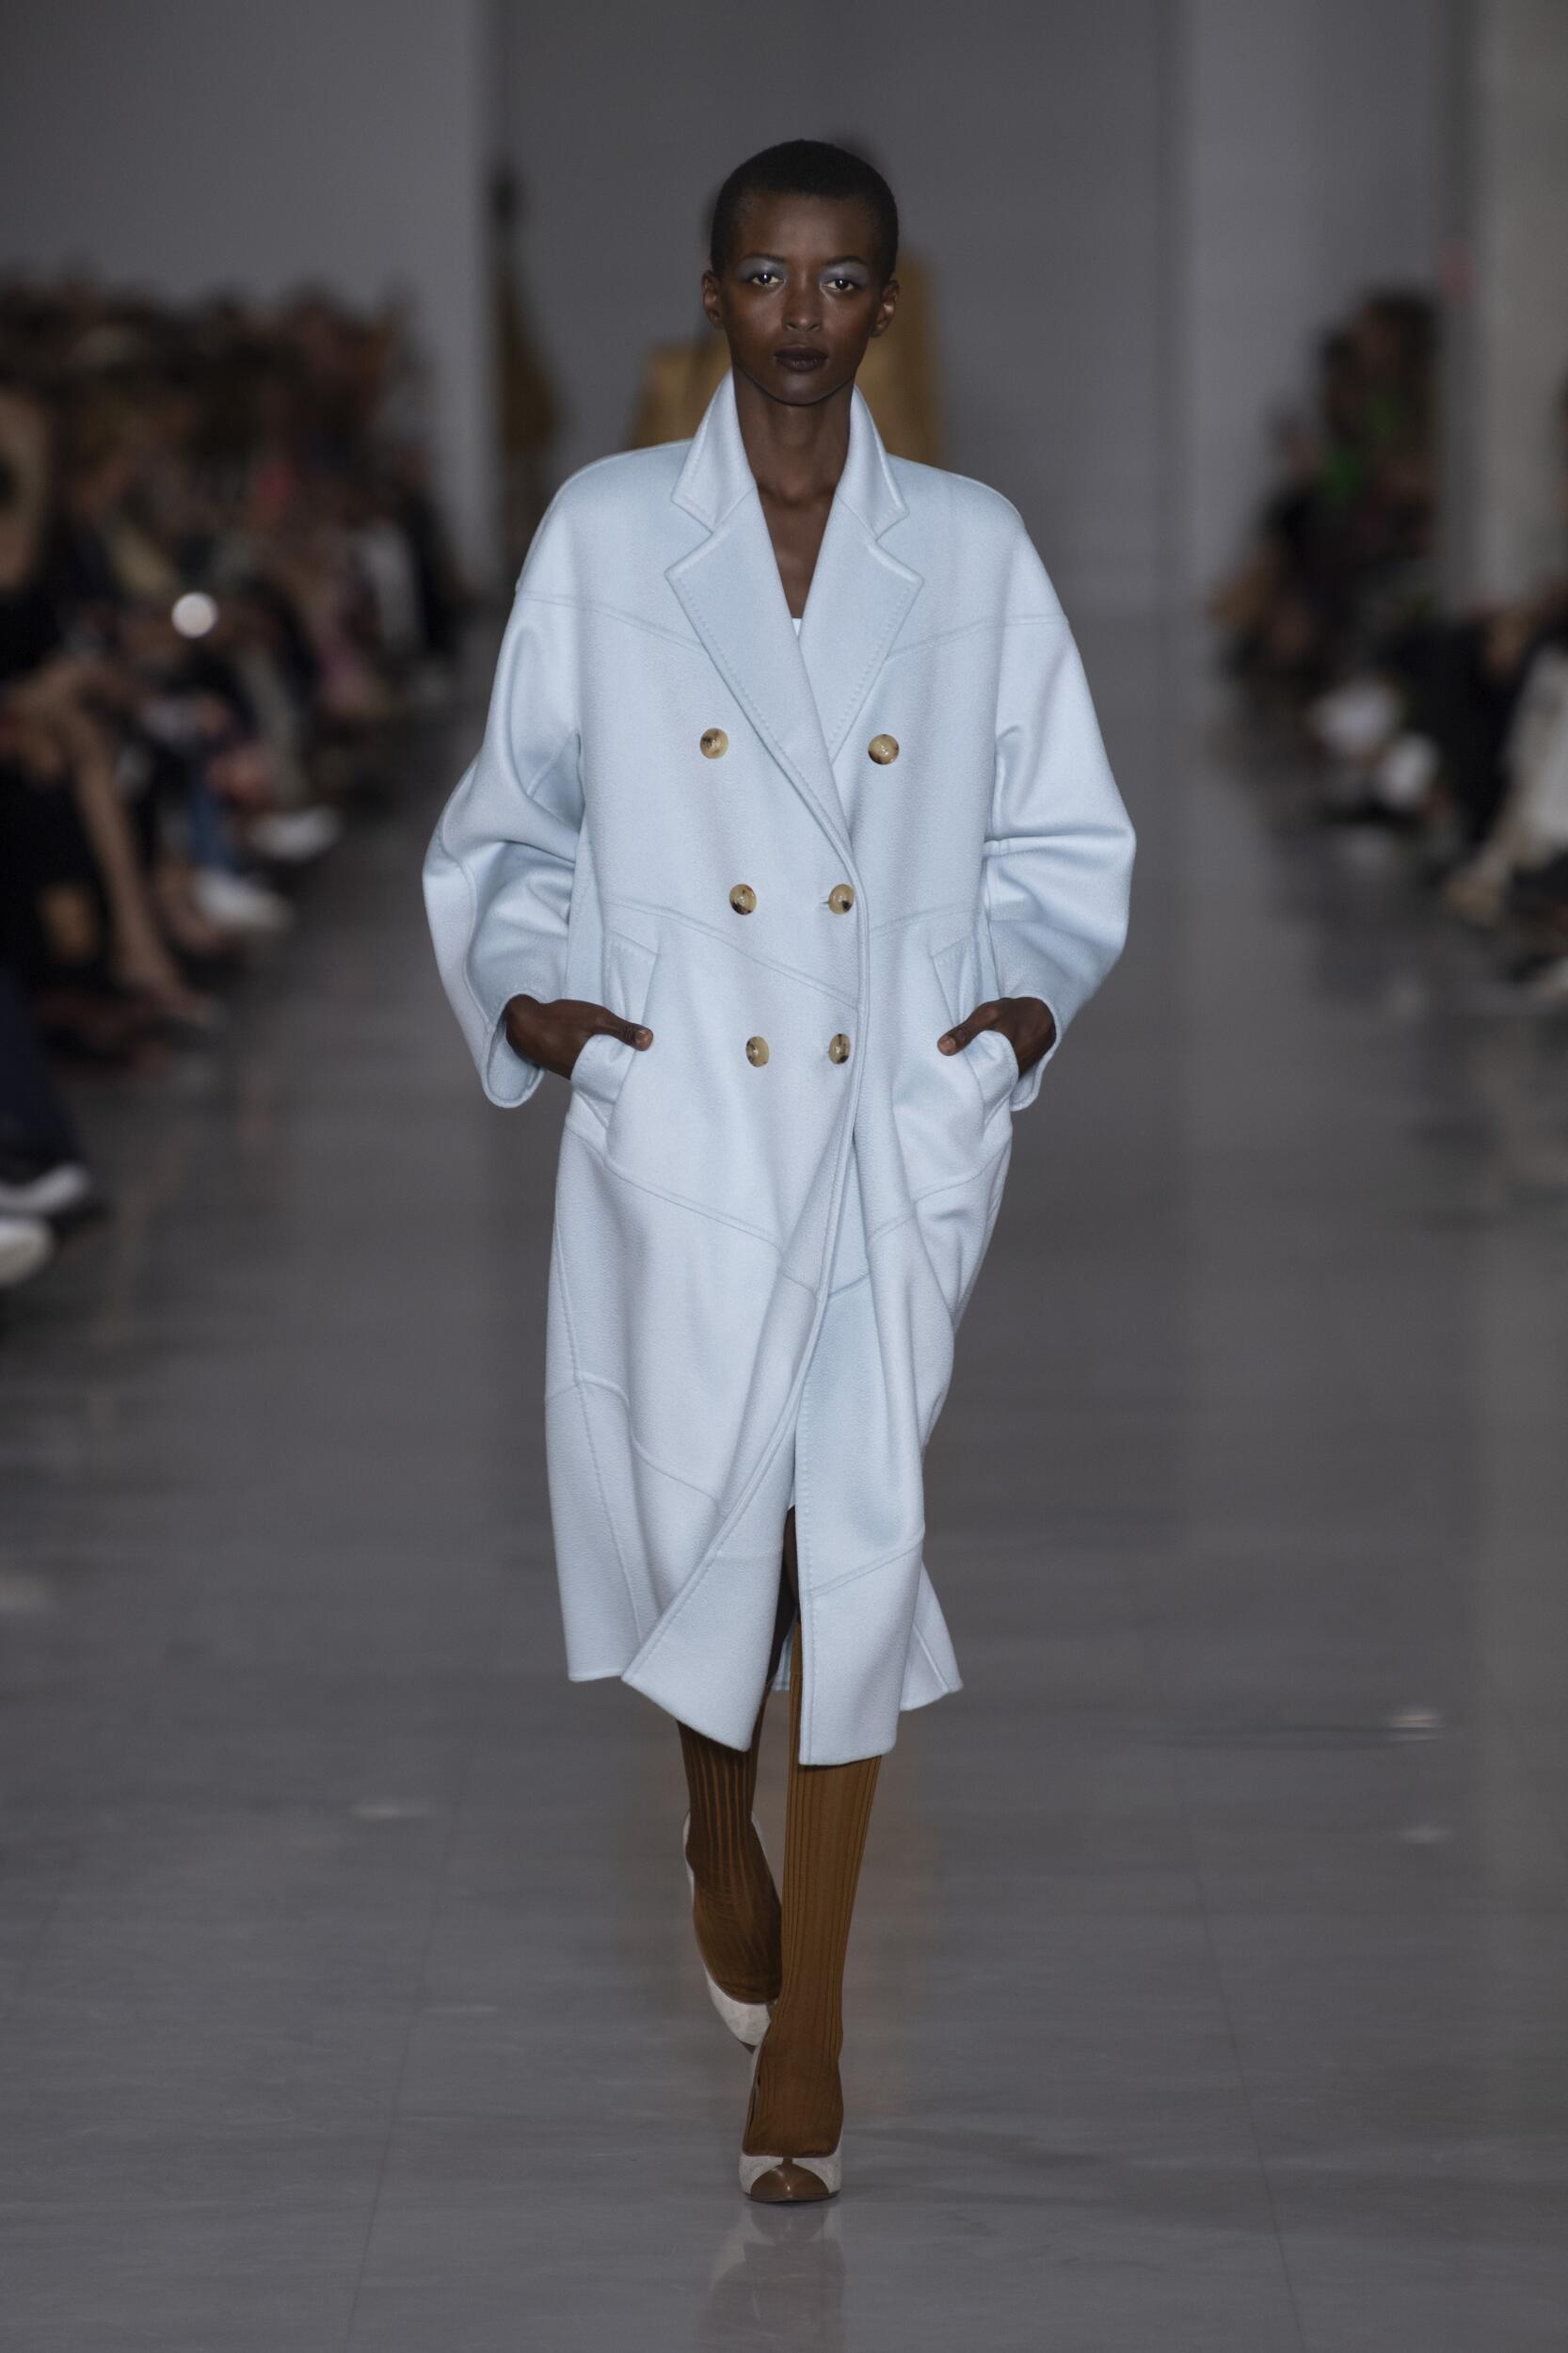 Fashion Model Max Mara Catwalk